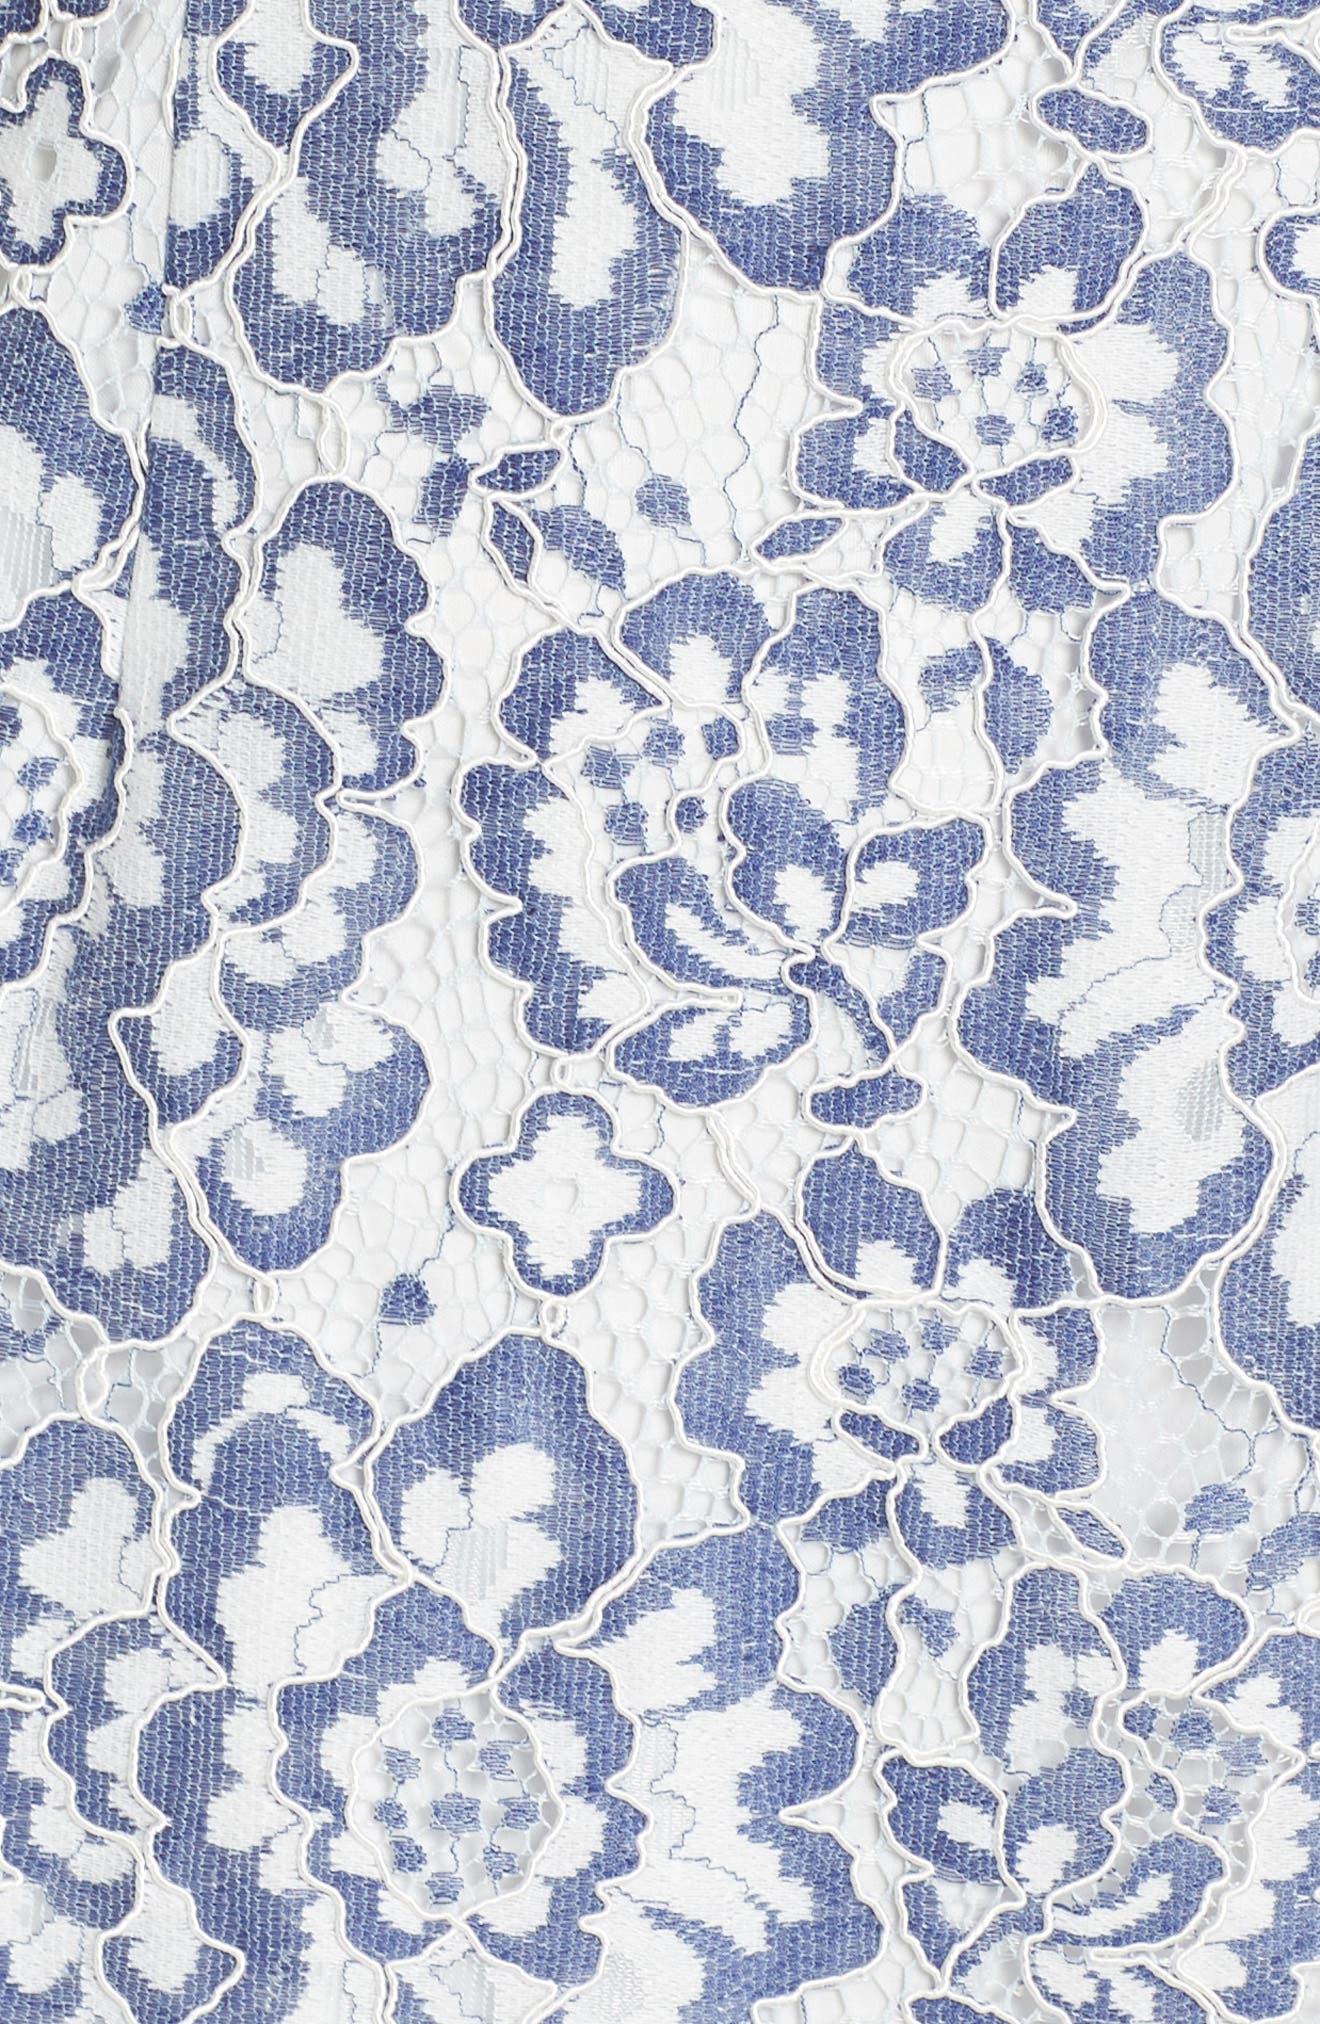 ADRIANNA PAPELL,                             Elisa Two Tone Lace Sheath Dress,                             Alternate thumbnail 6, color,                             481